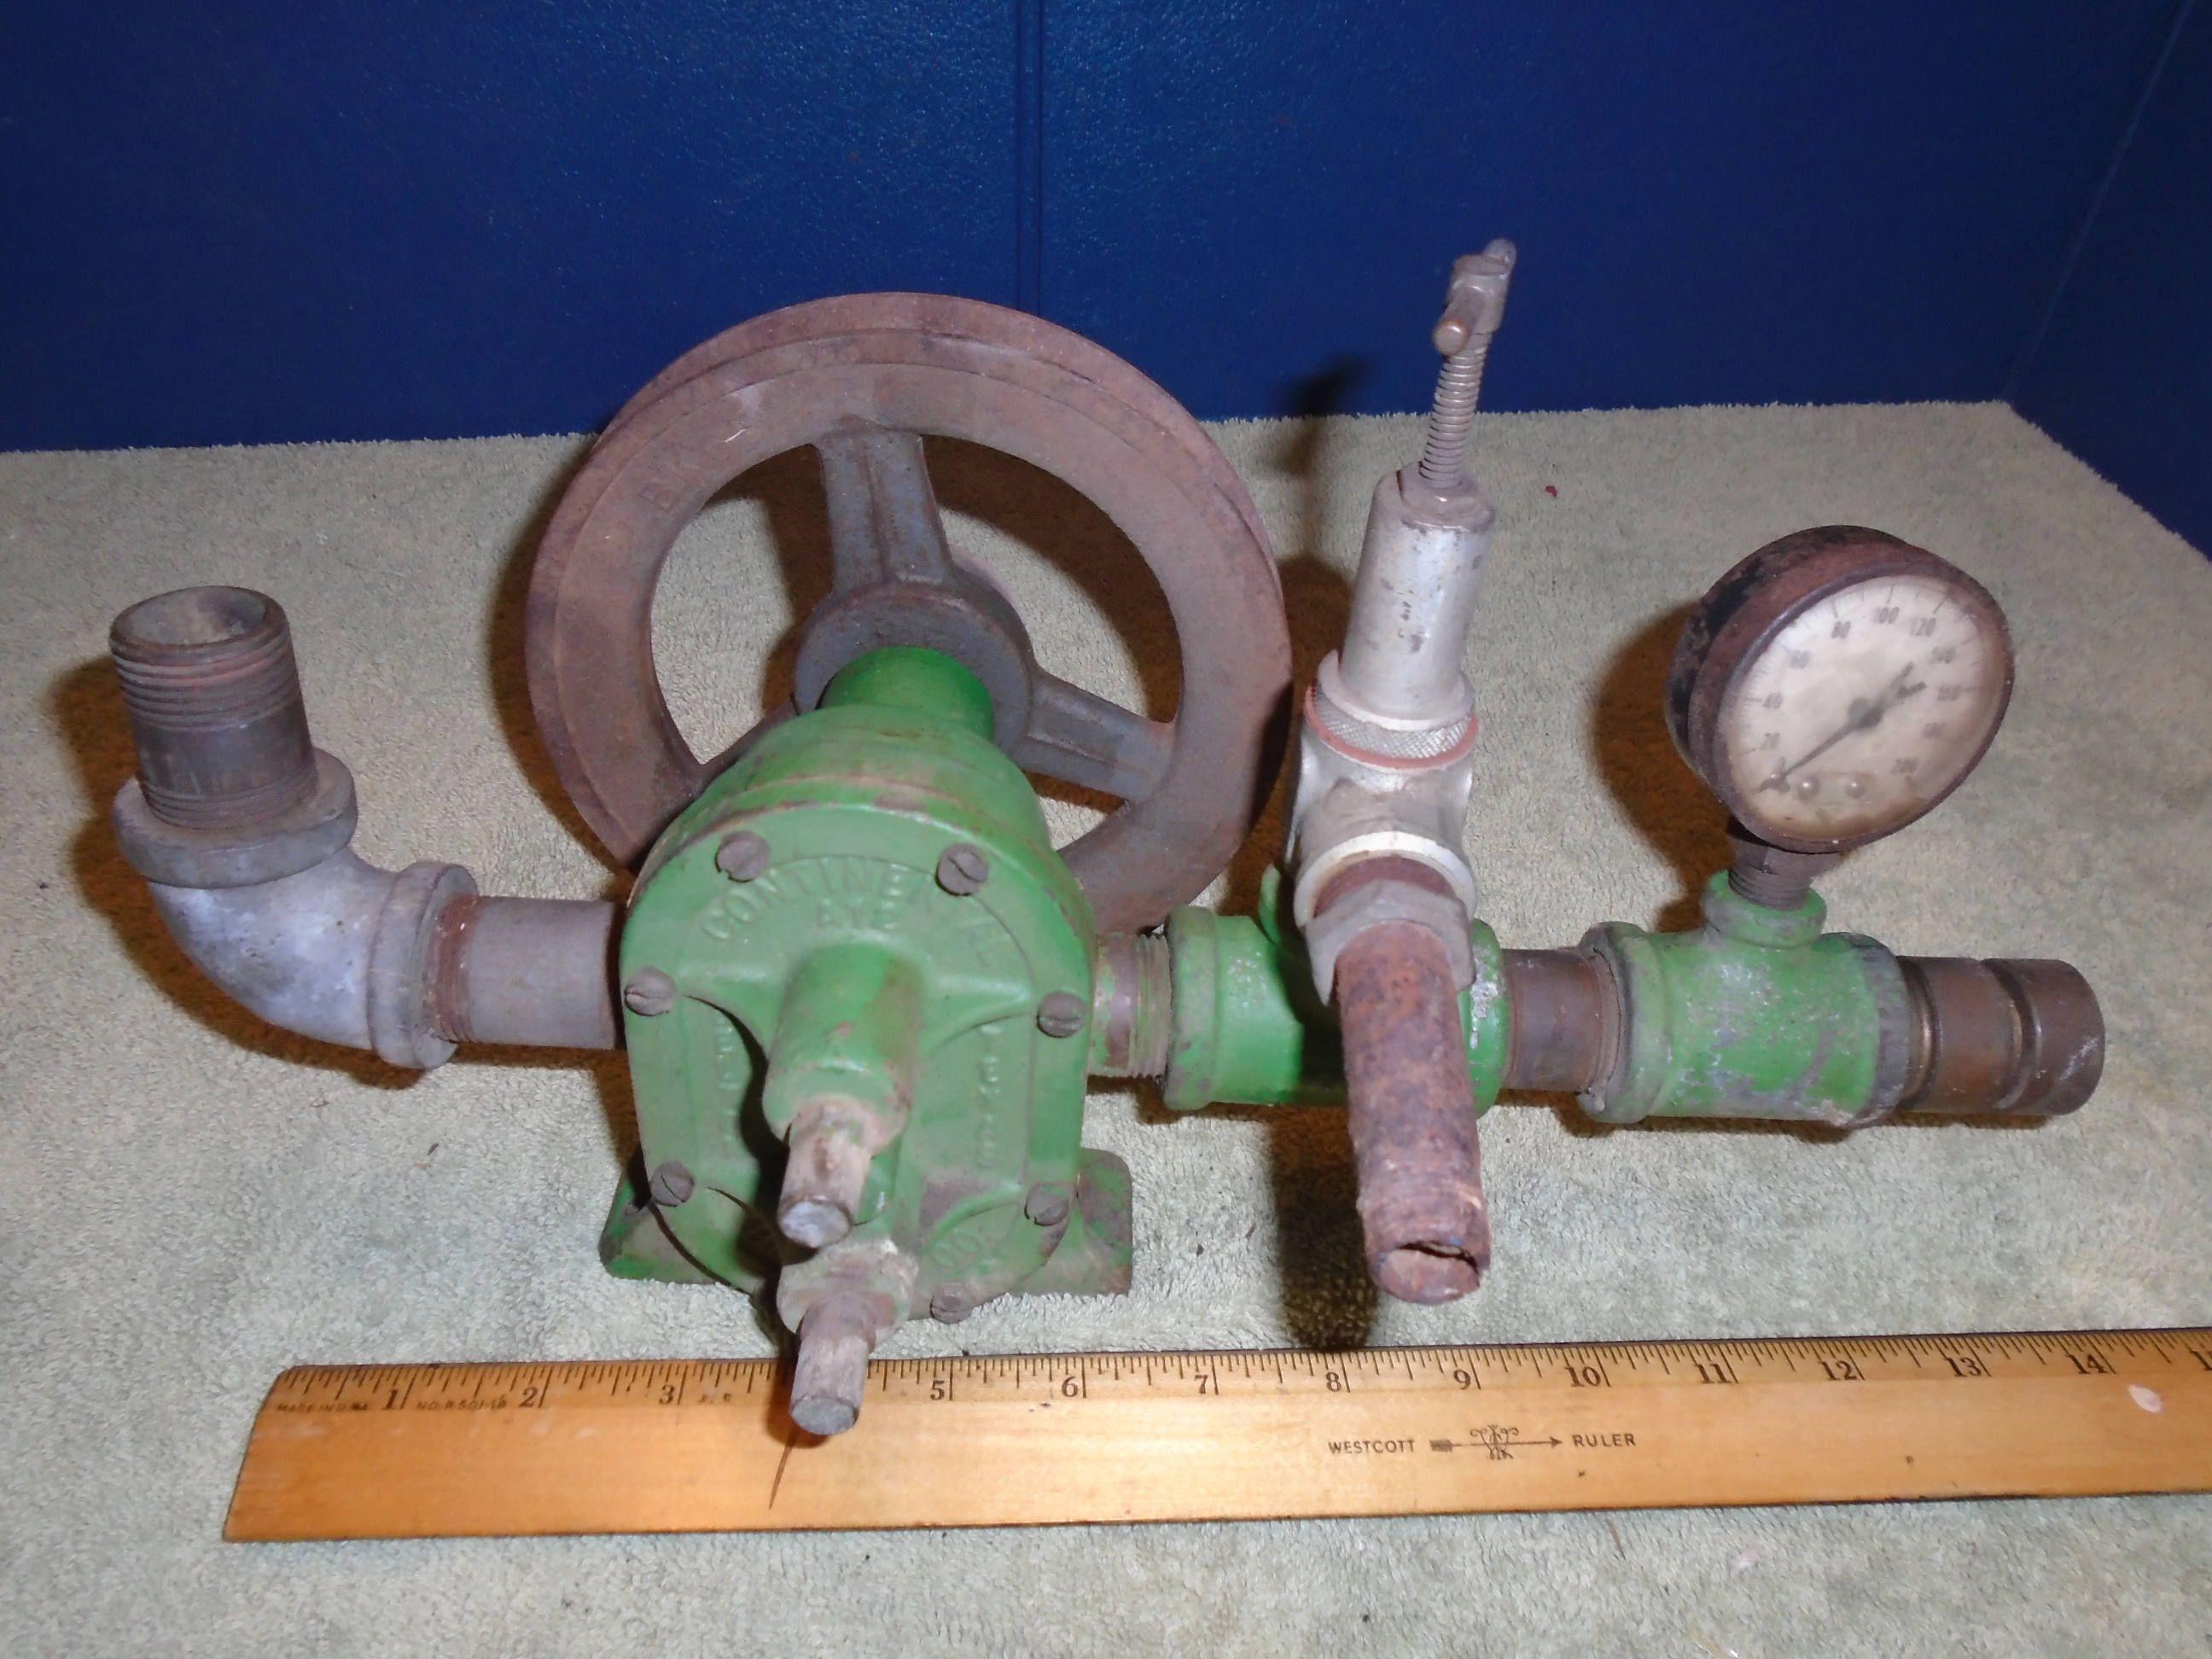 Continental Machinery. Steampunk parts. Industrial. Gauge